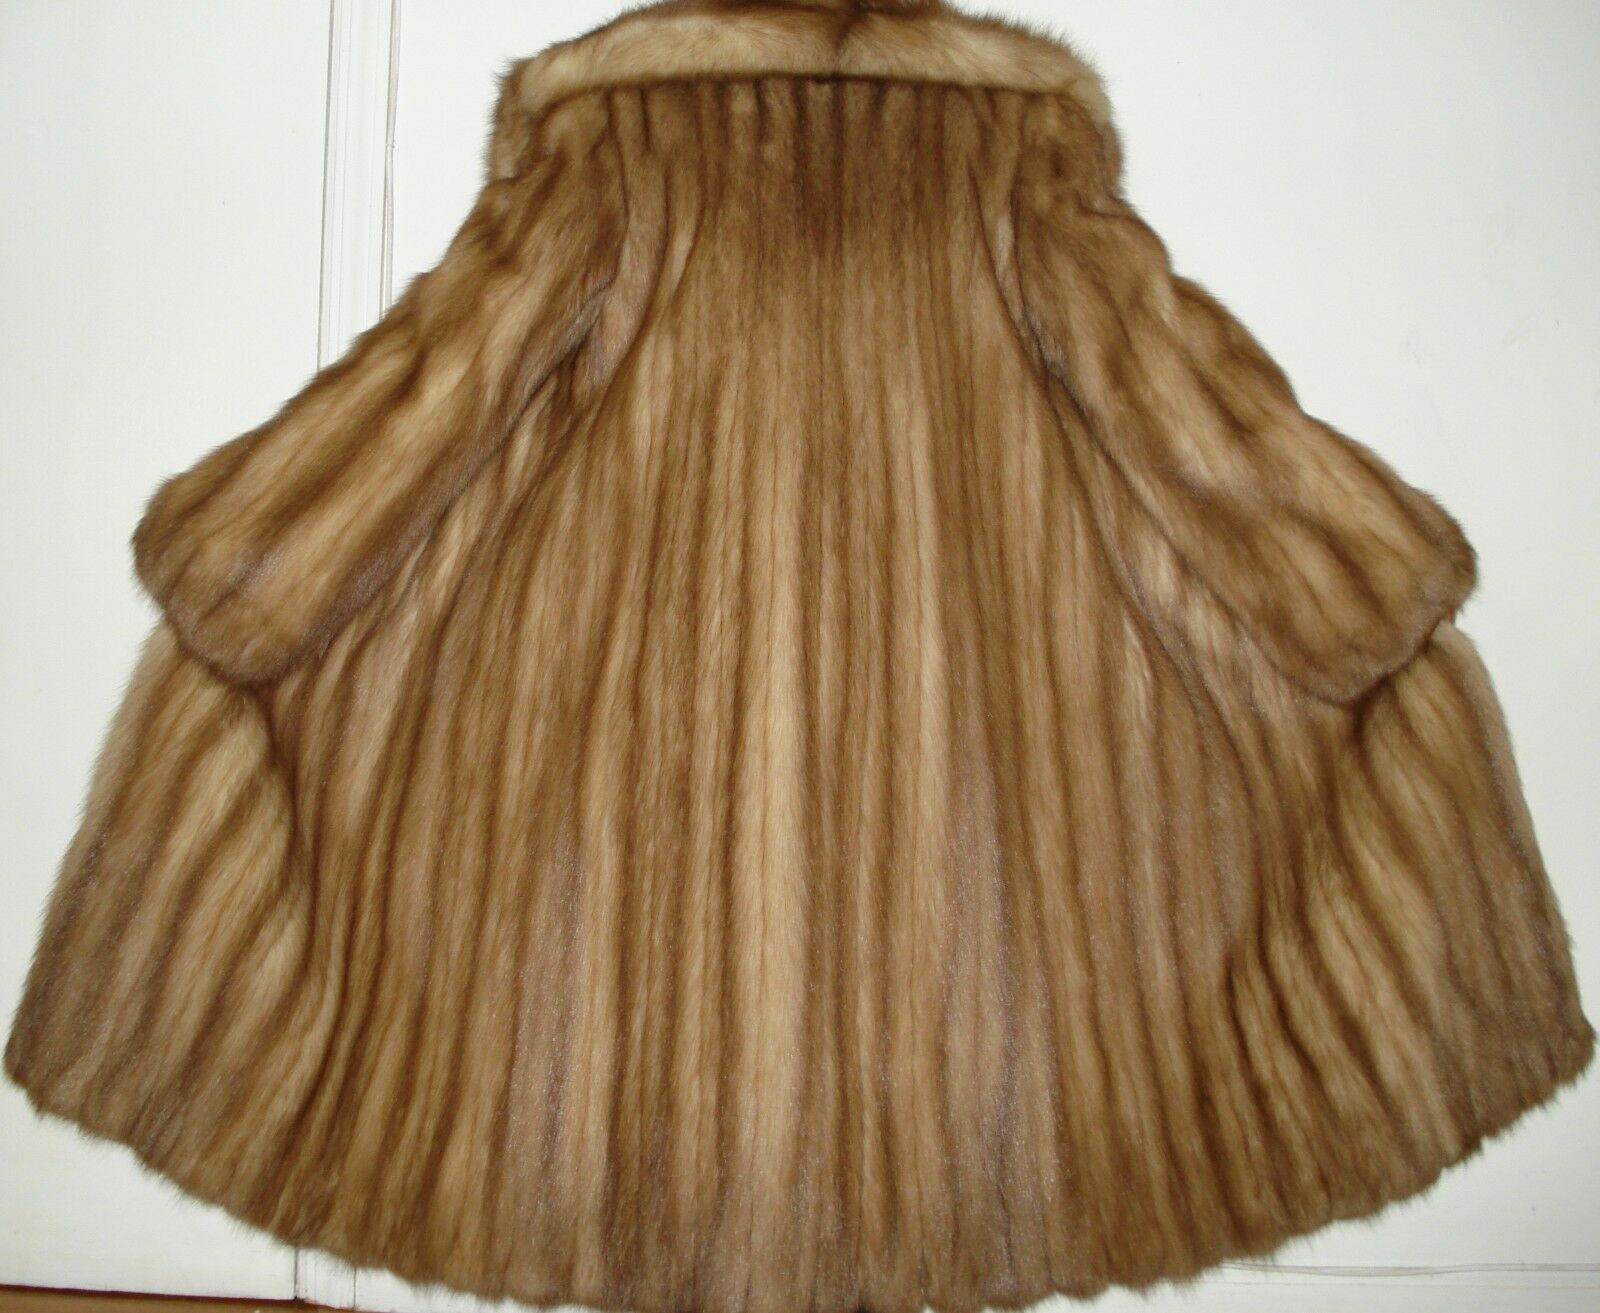 Revillon Stone Marten Sable Fur Coat Size 4-6 Excellent Condition FREE SHIPPING